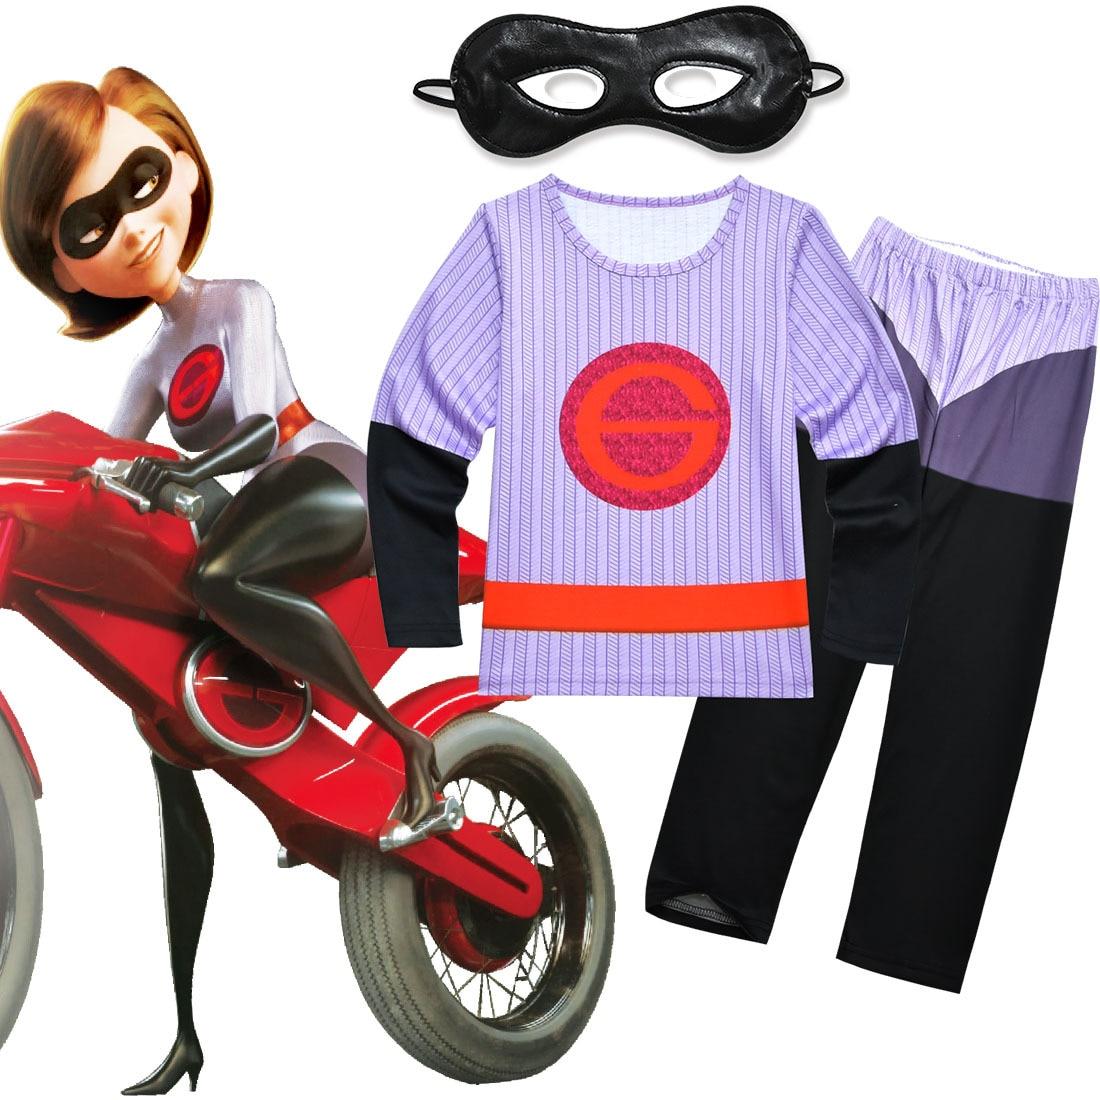 3b069ab5b145 Kids The Incredibles 2 Costume Set Boys Girls Cartoon T Shirt Pants Mask  Childrens Nightgown Halloween Cosplay Costume